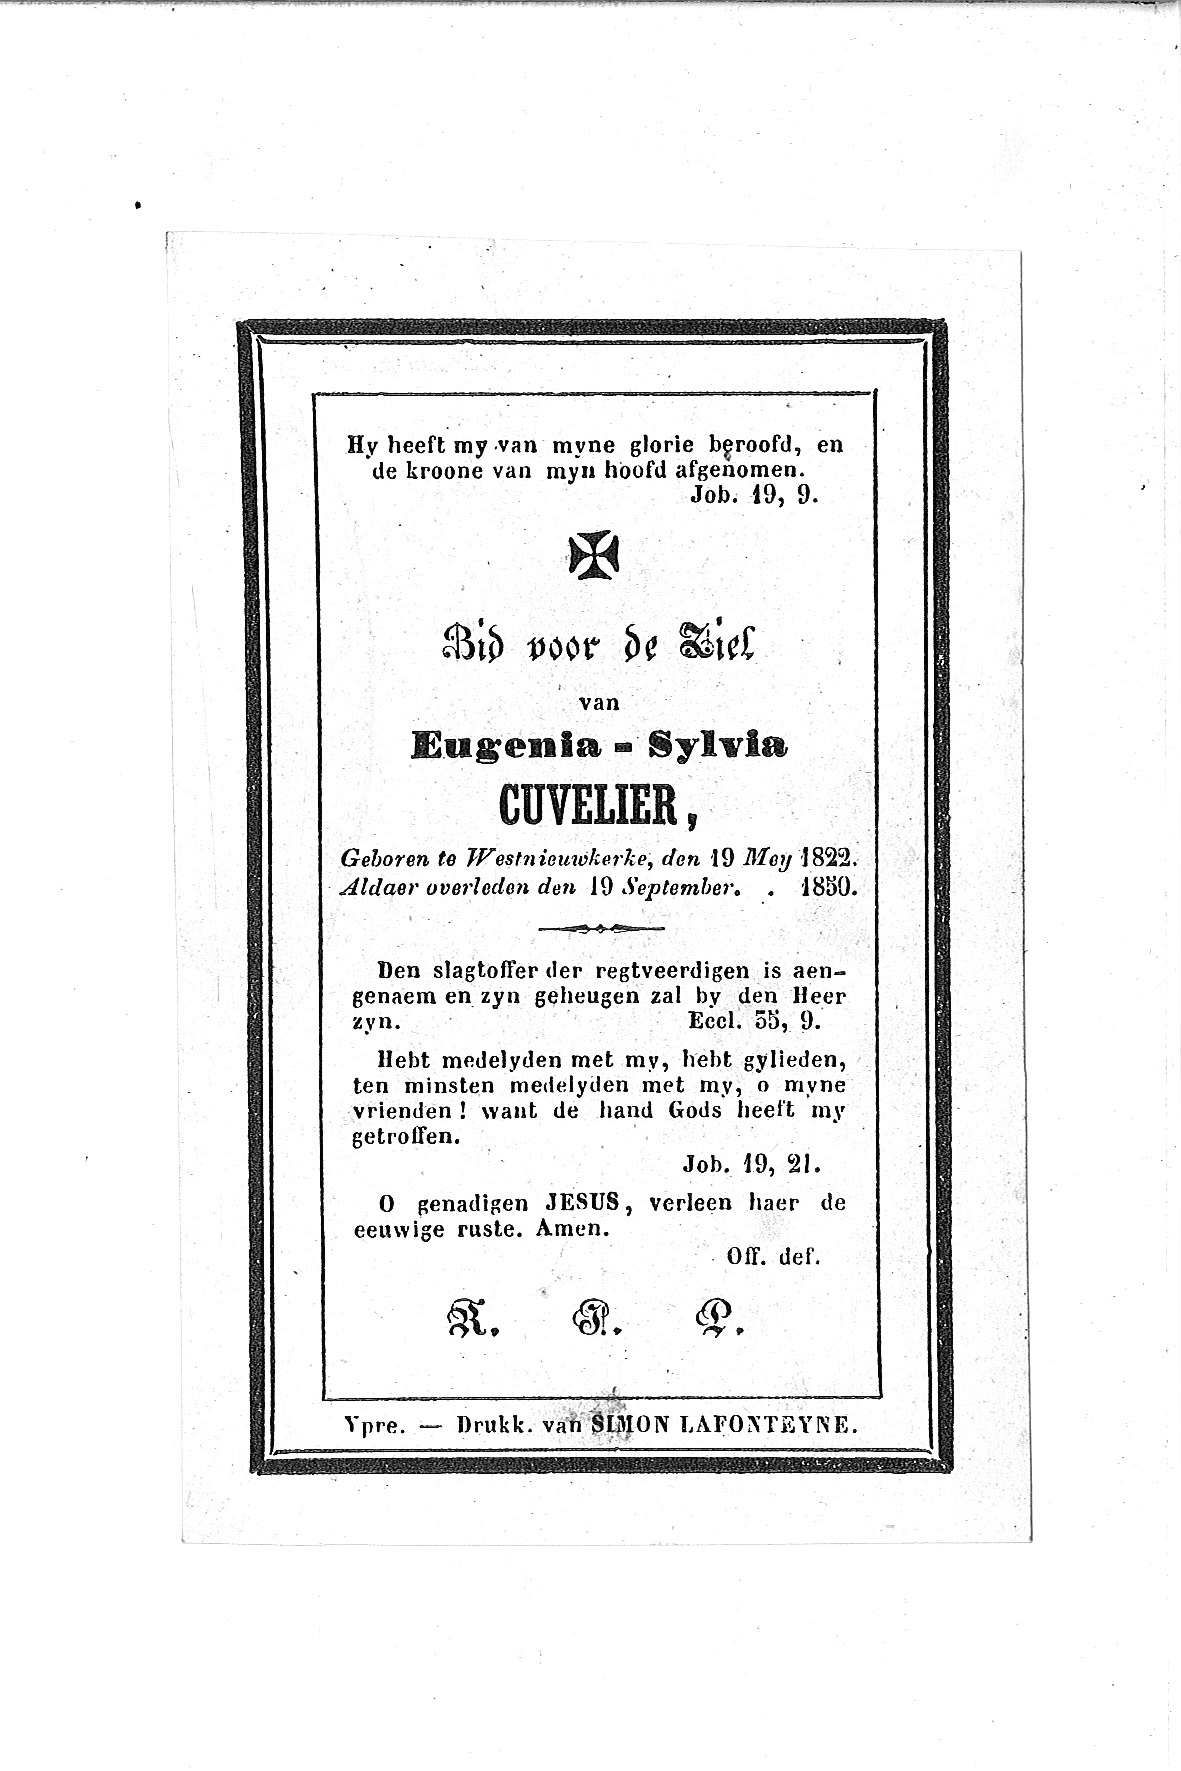 eugenia-sylvia(1850)20120329074916_00025.jpg